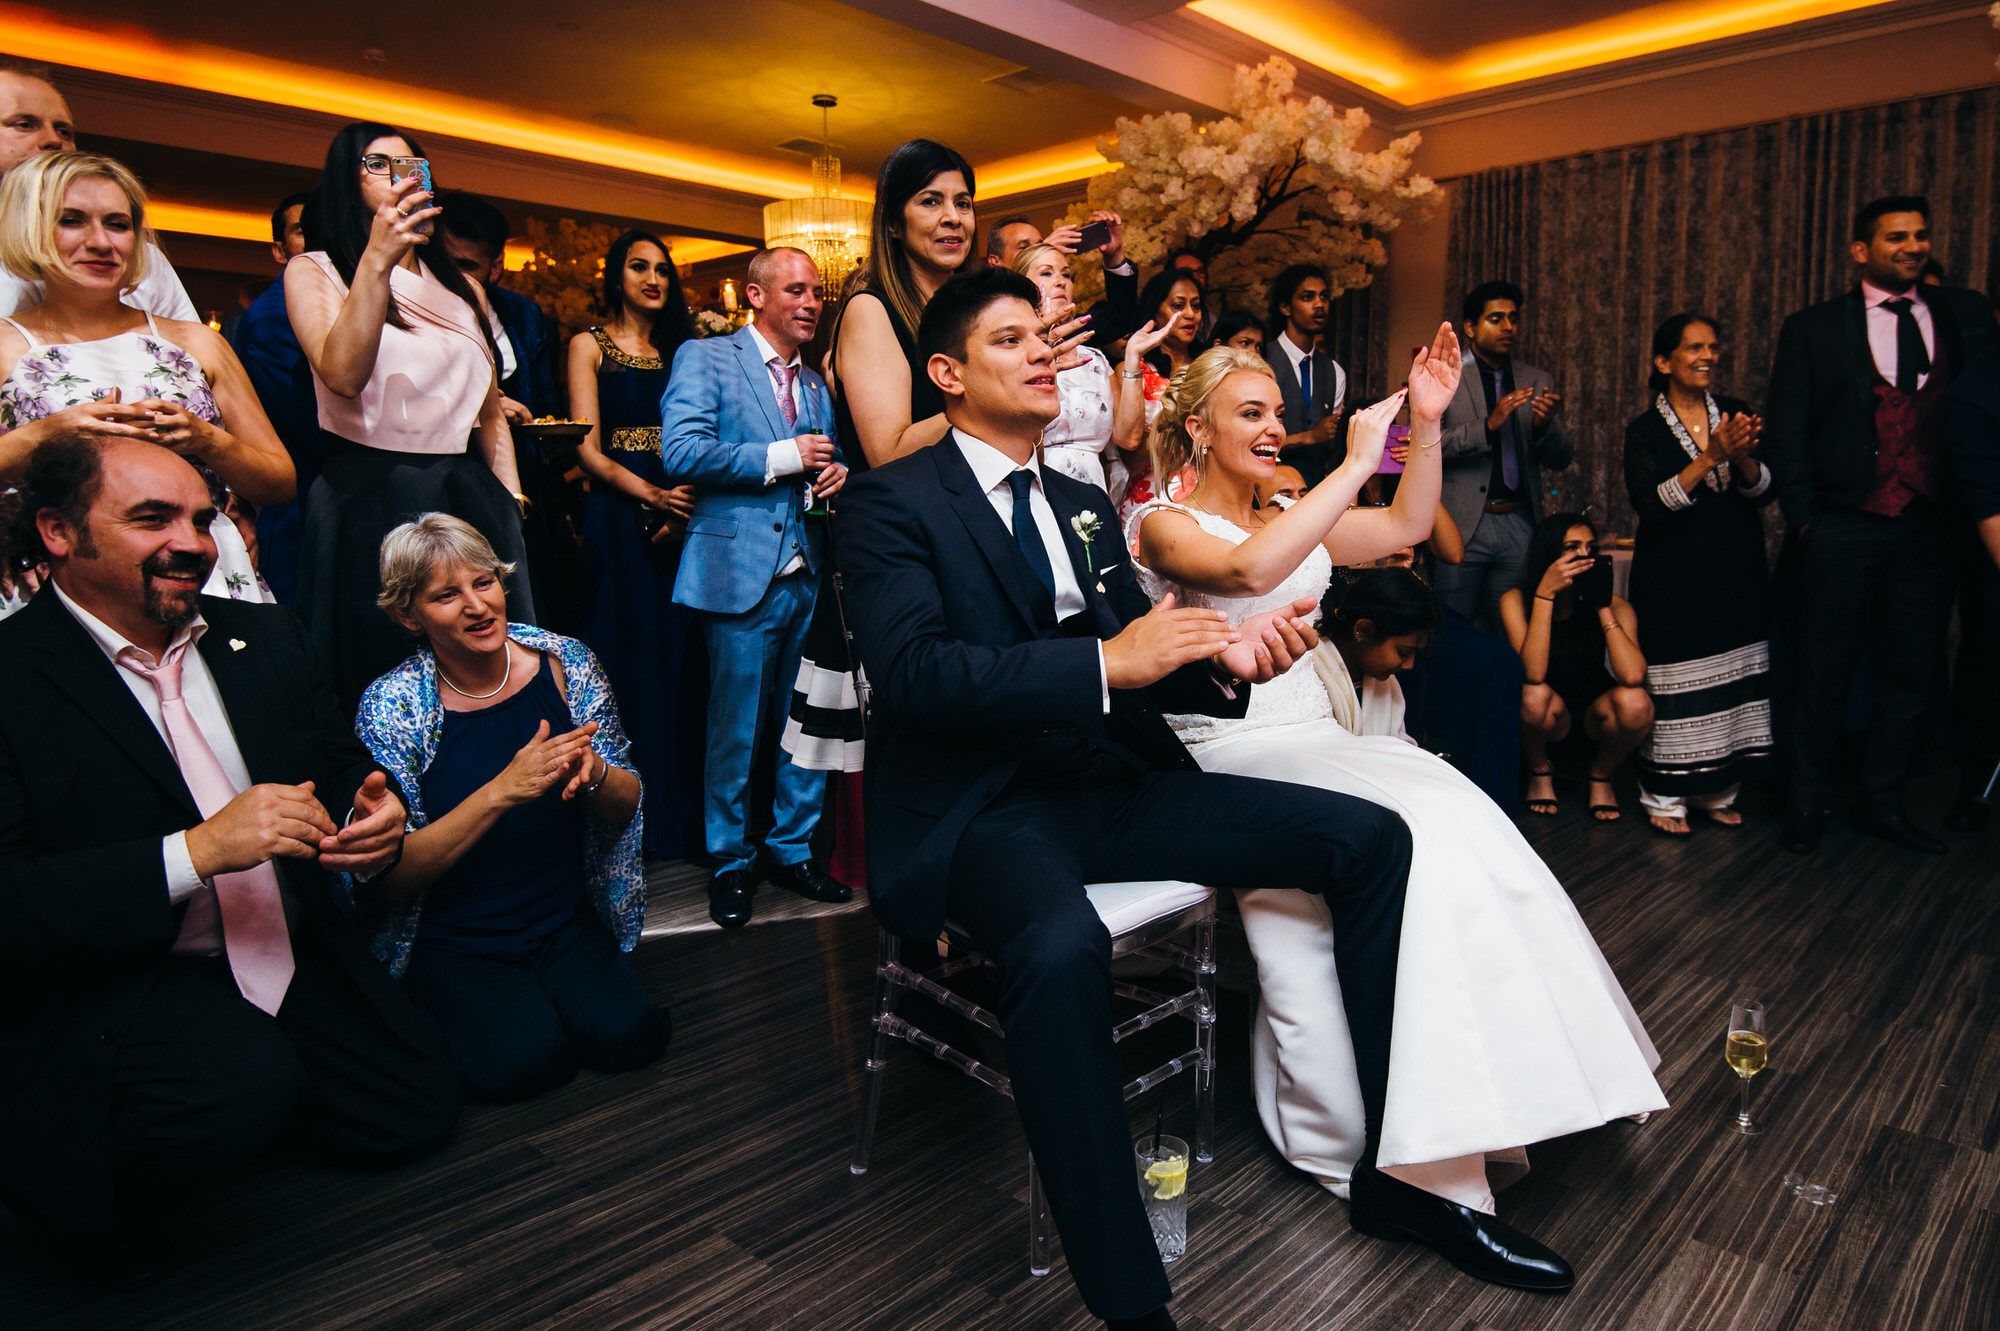 Merrydale manor wedding photography 104